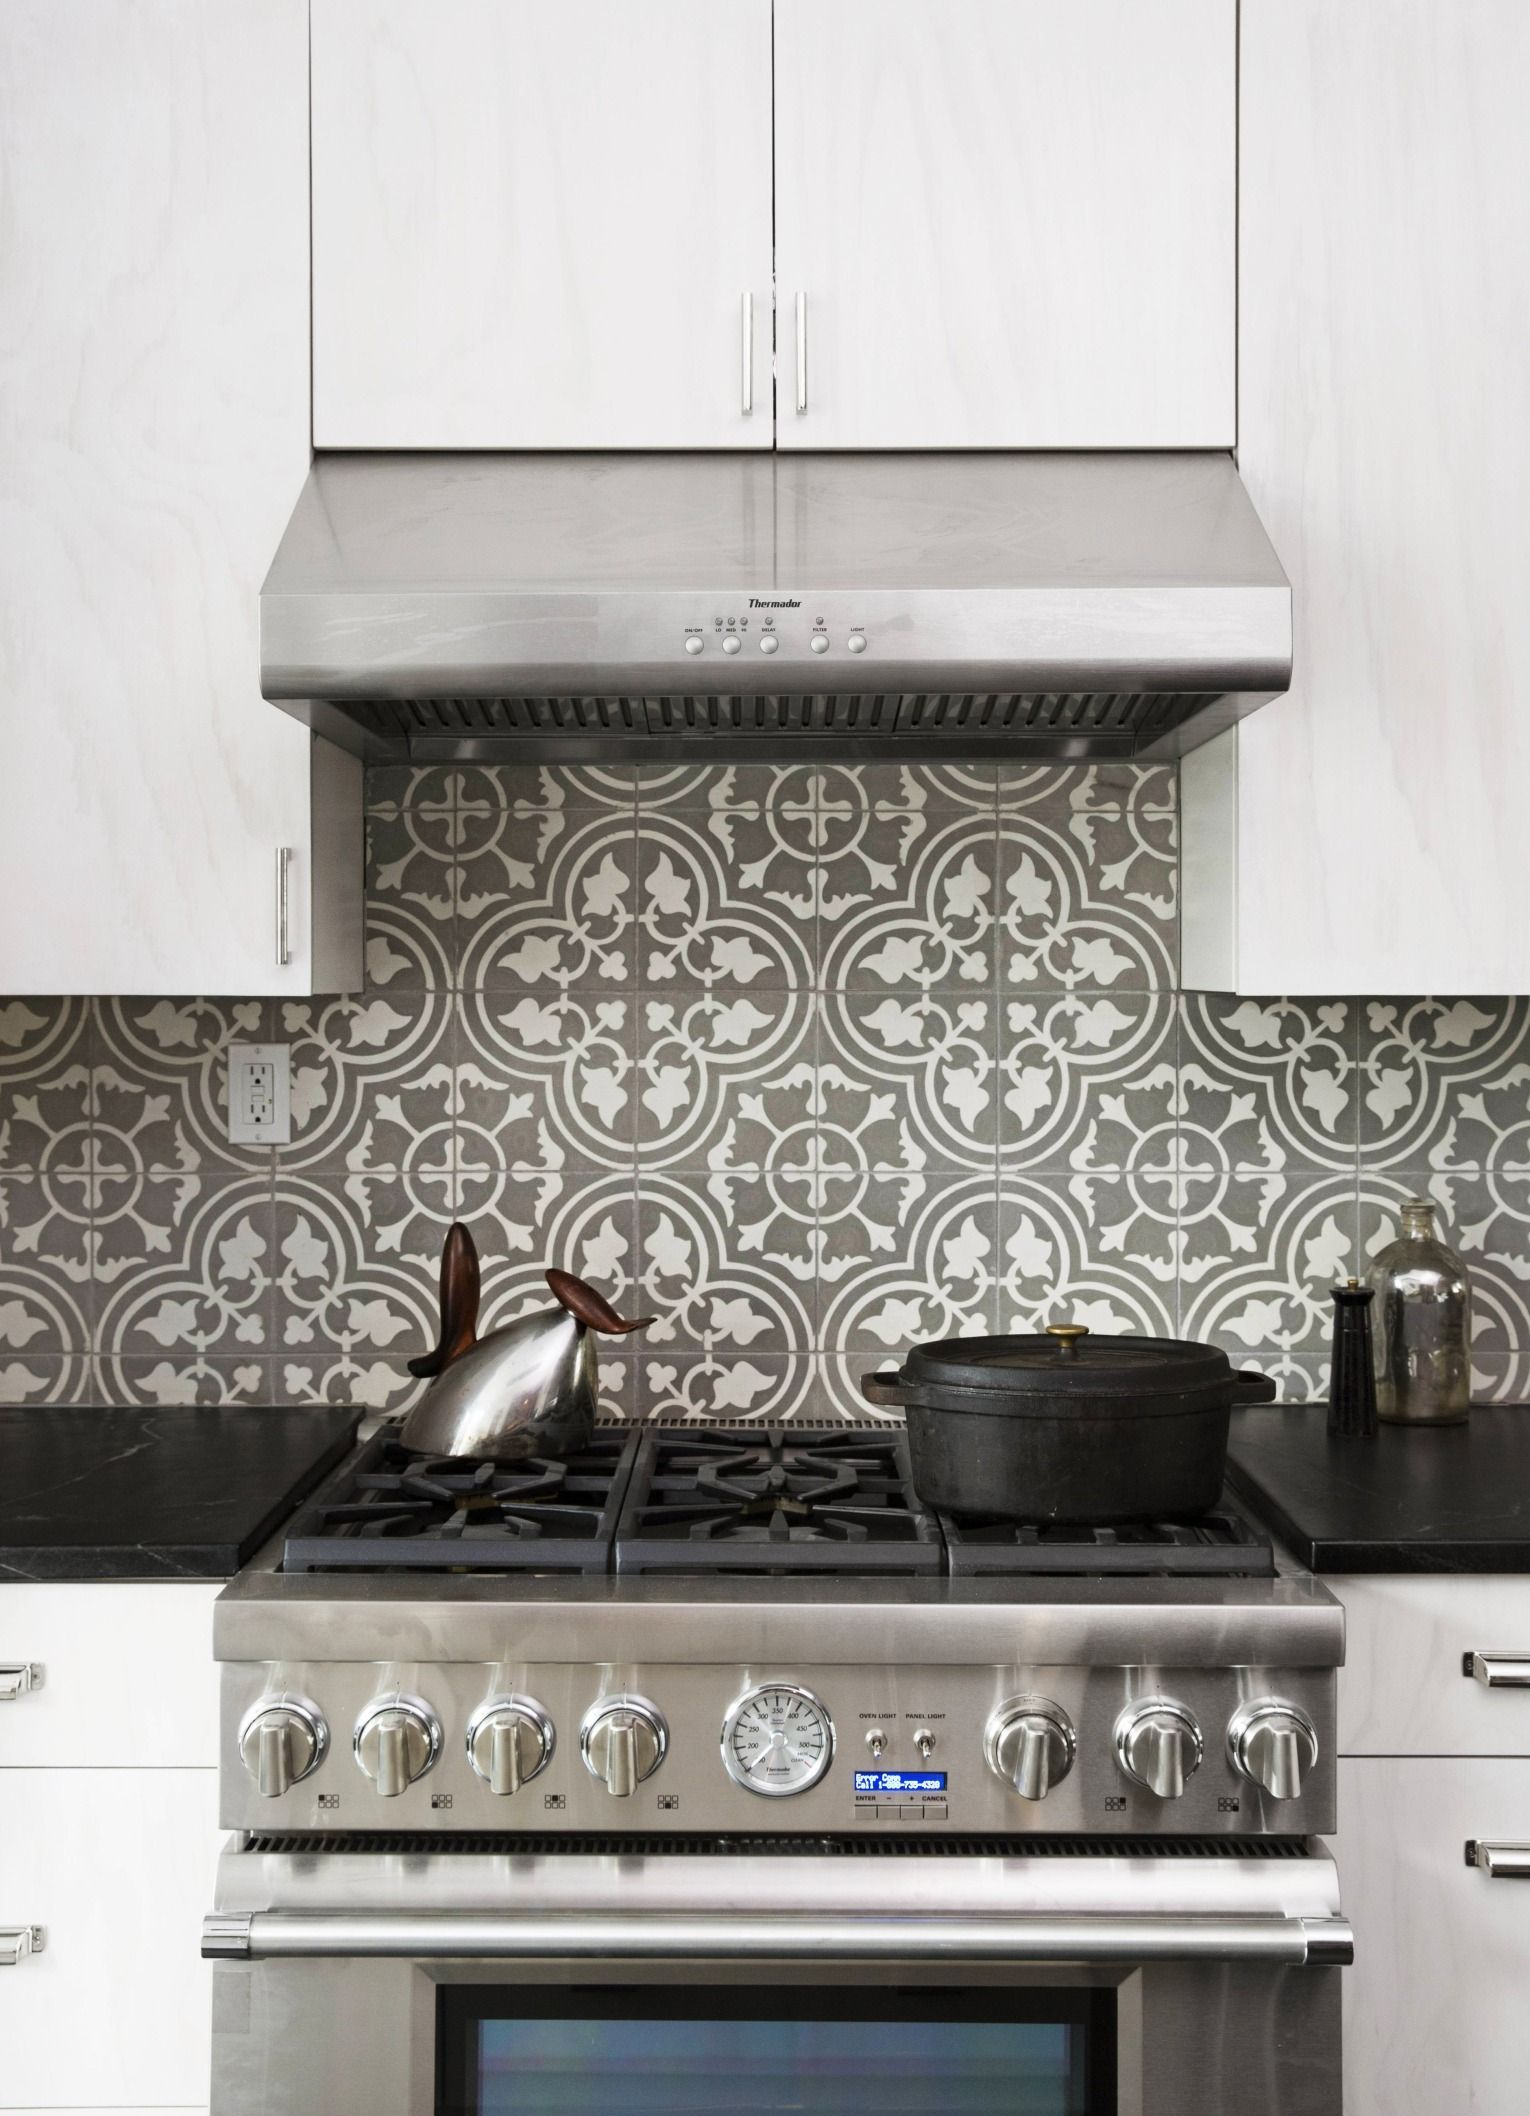 Brooklyn Based Wrk Design Transforms A 115 Year Old Brownstone